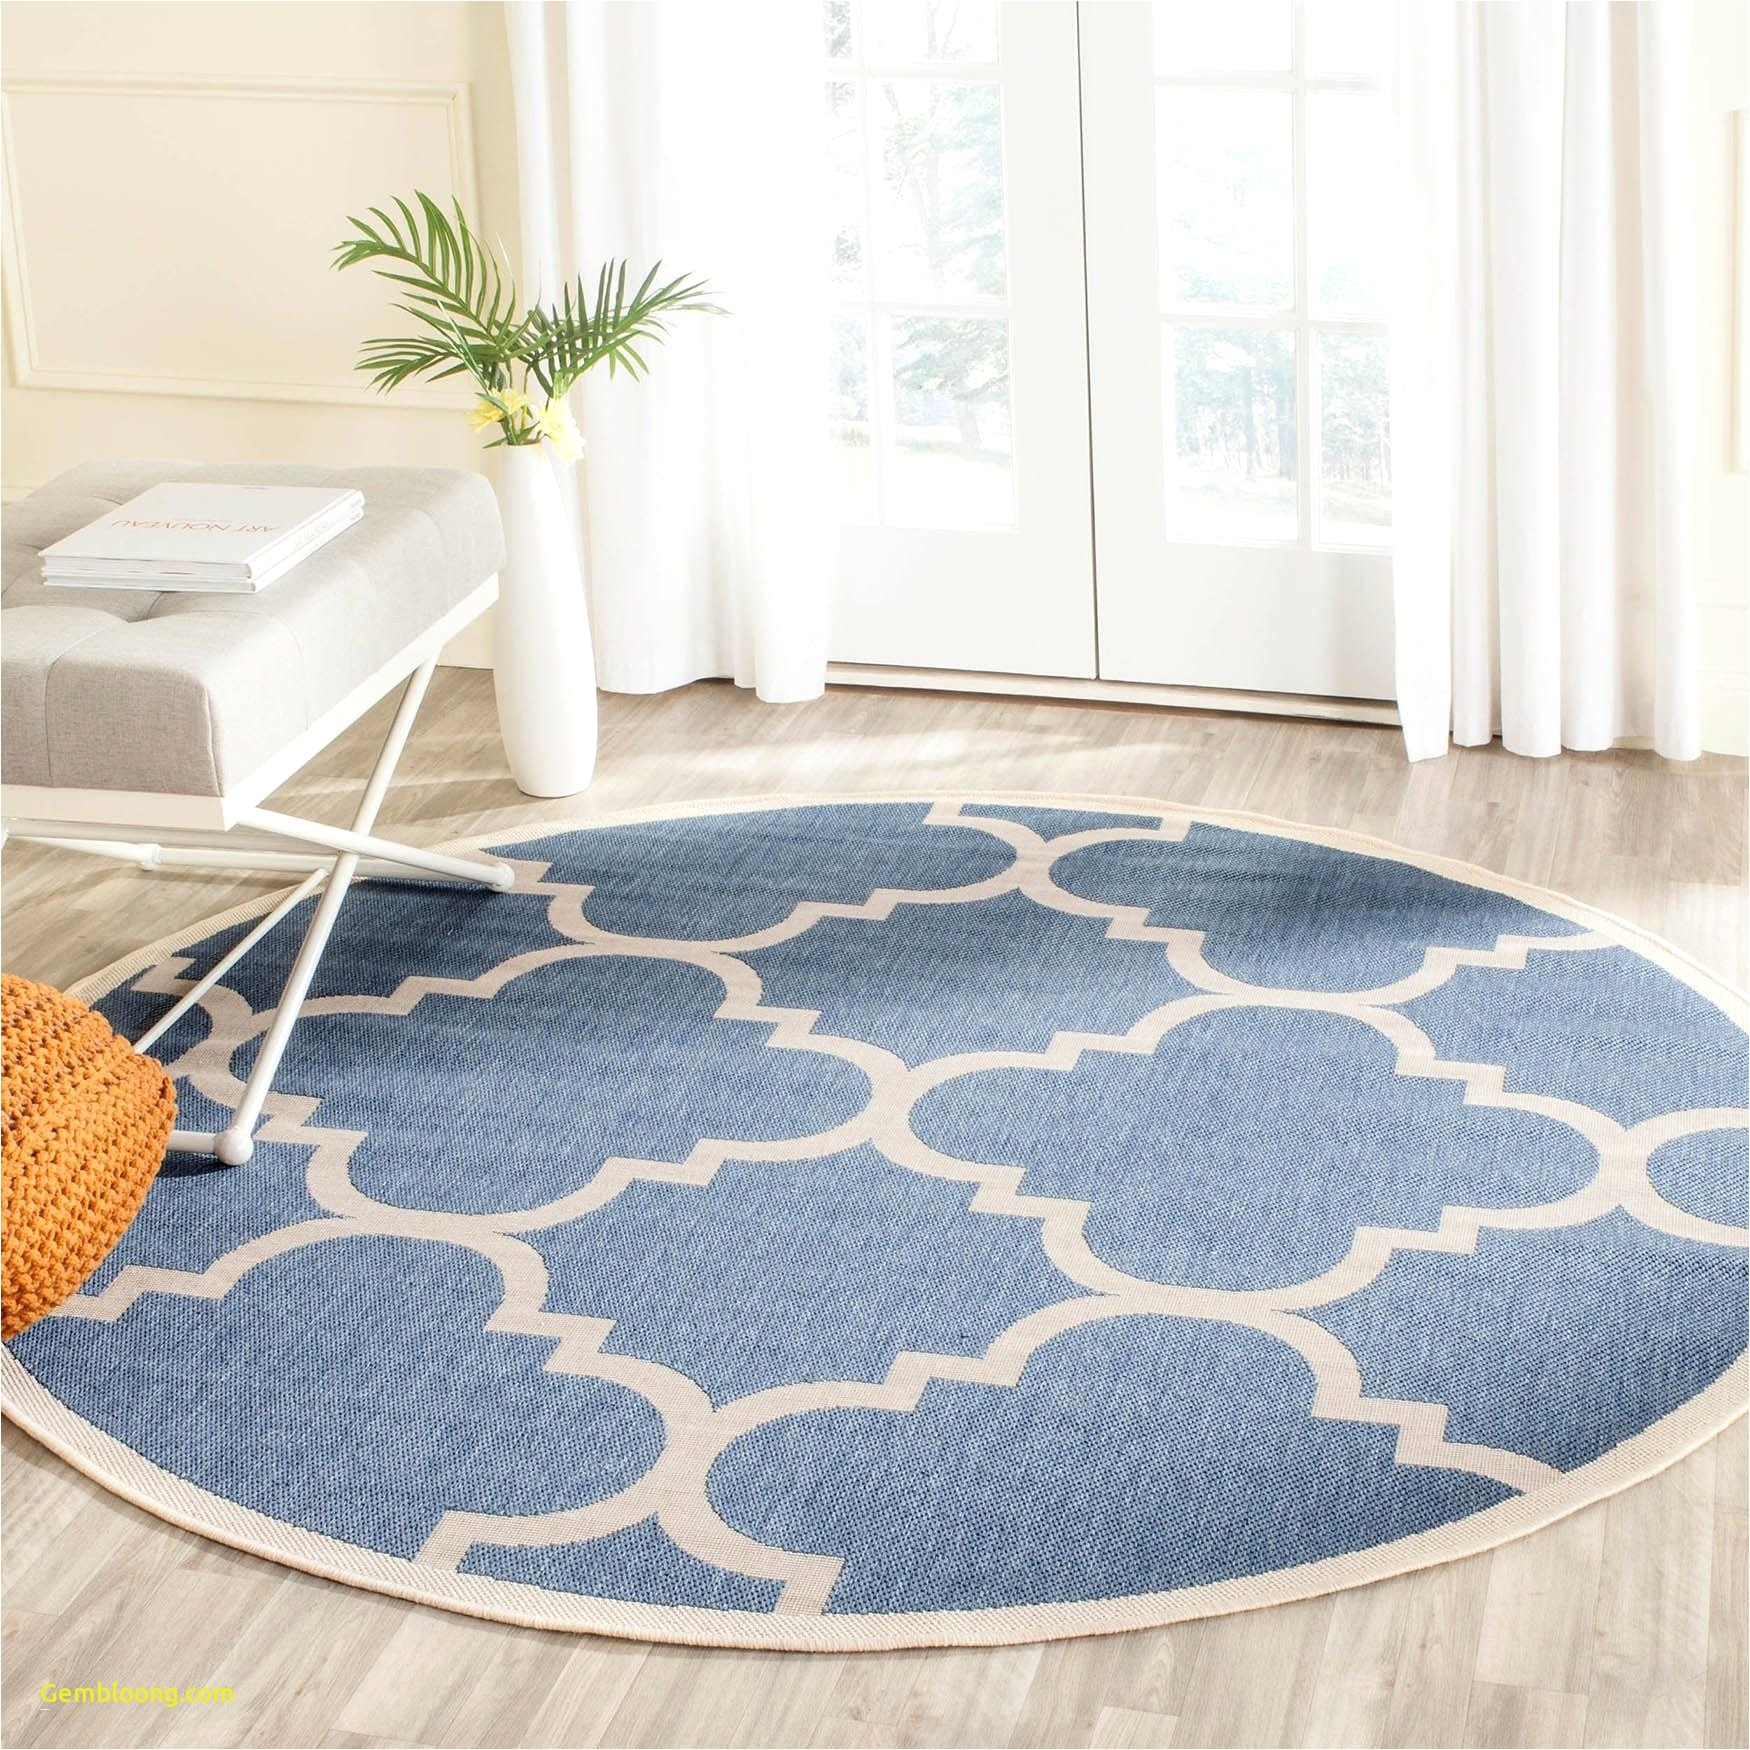 Typical Outdoor Rug Sizes Home Design Outdoor Patio Rug Fresh Outdoor Rug Ideas New Patio